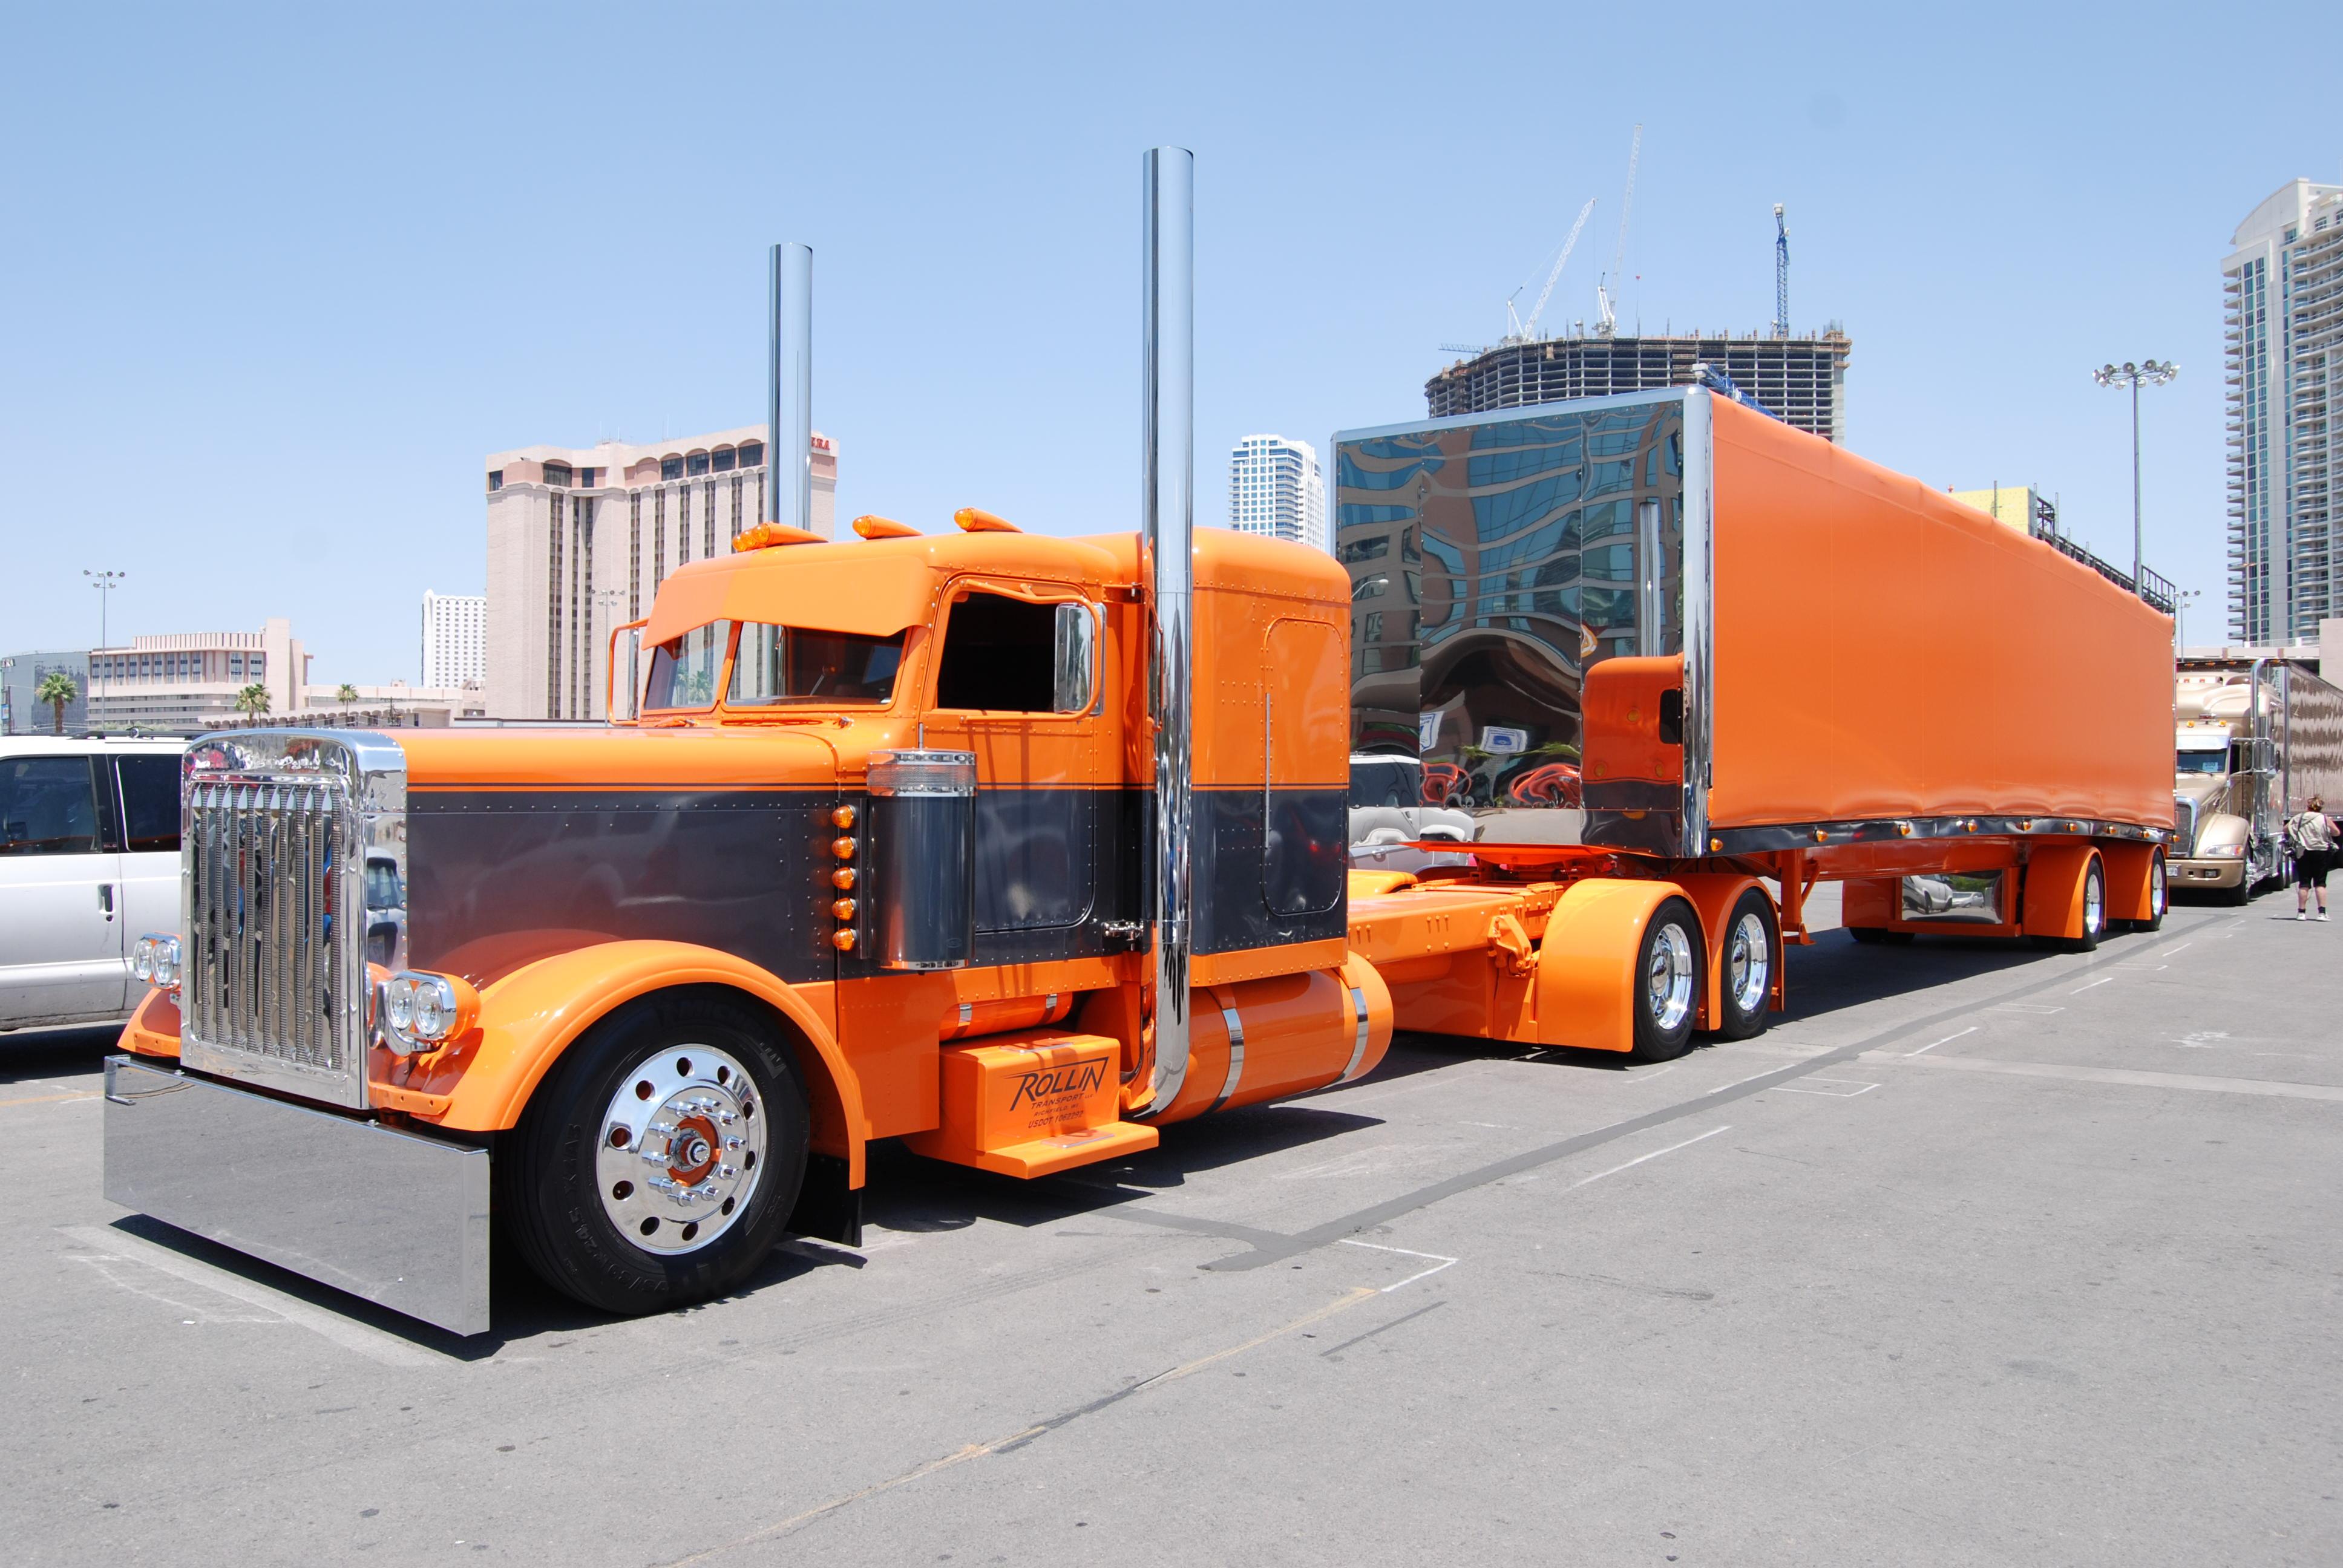 Trucks Custom Big Rig Orange : Semi trucks tractor rigs peterbilt wallpaper